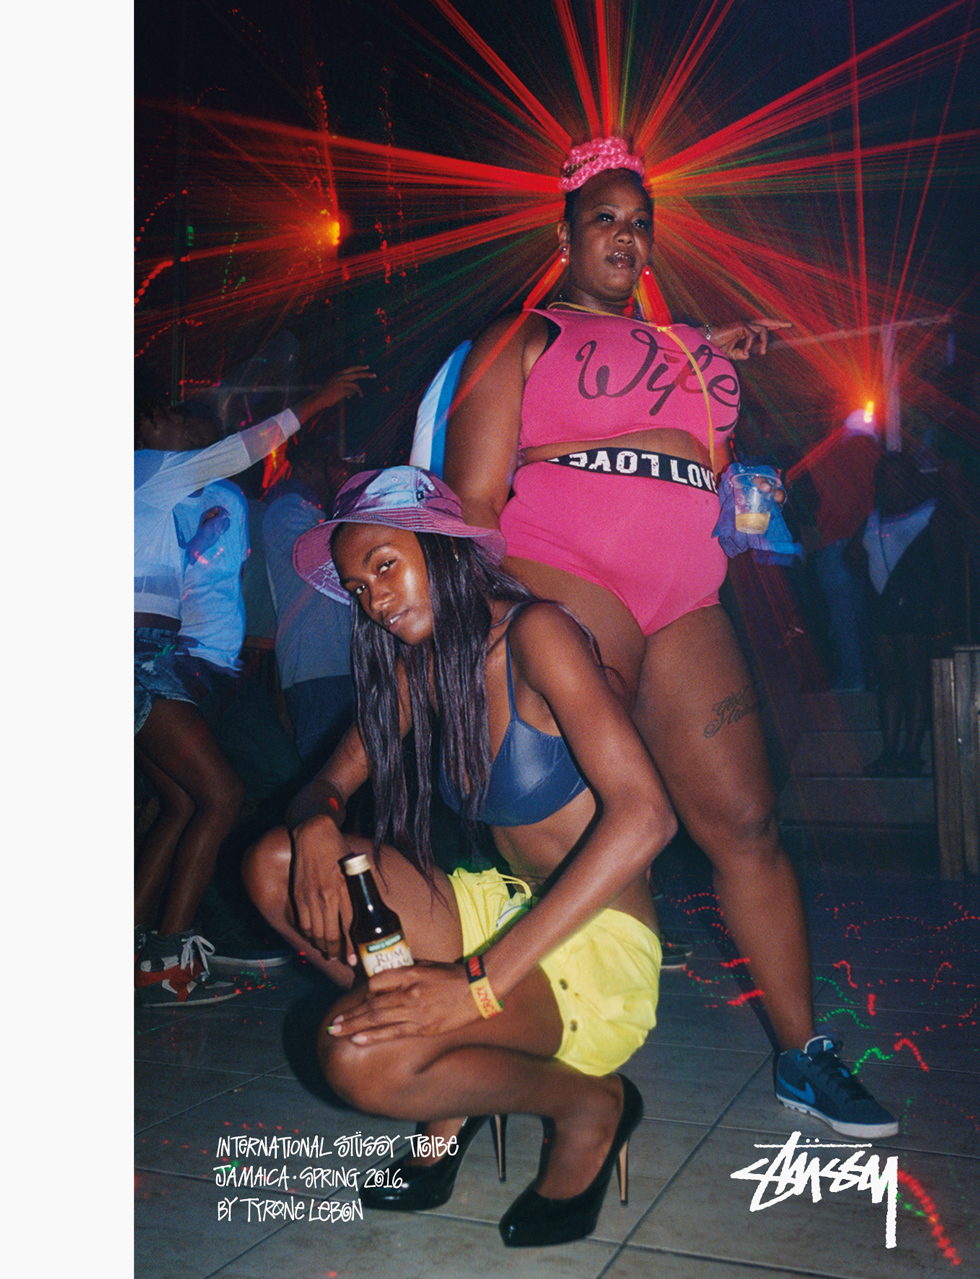 Stussy-Spring-2016-Jamaica-Campaign-by-Tyrone-Lebon5.jpg